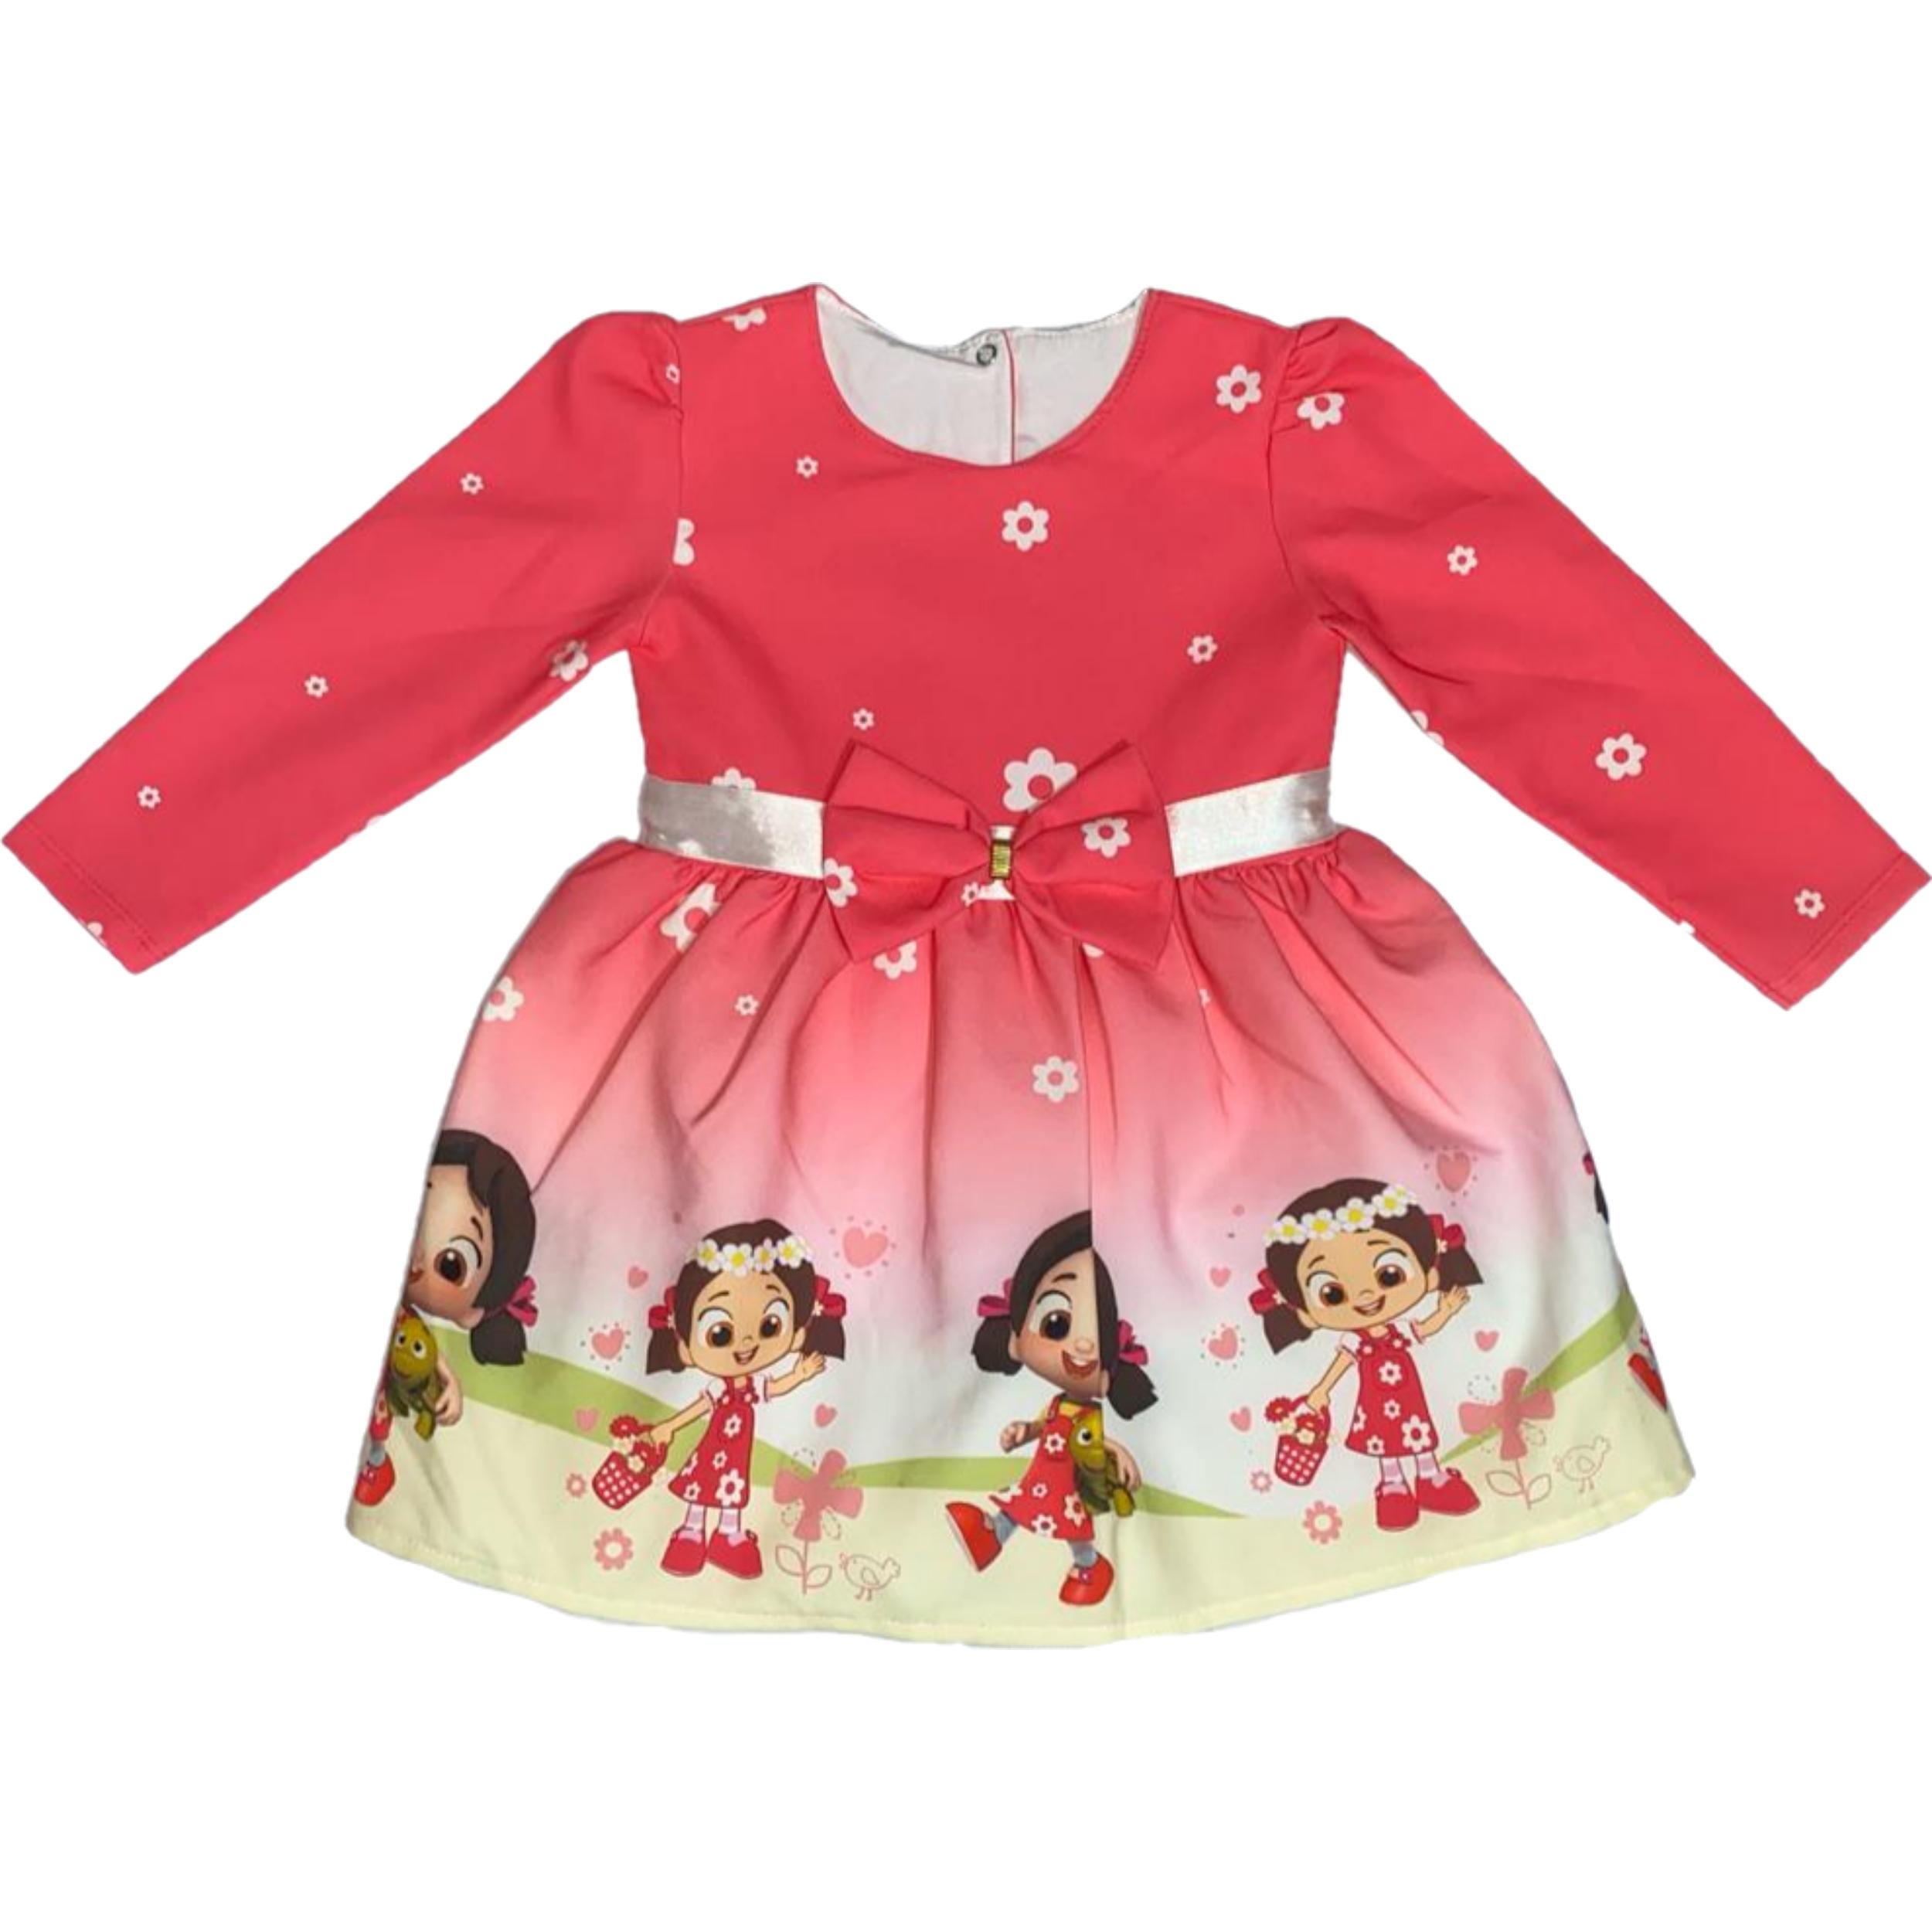 پیراهن دخترانه طرح عروسکی کد ۴۱